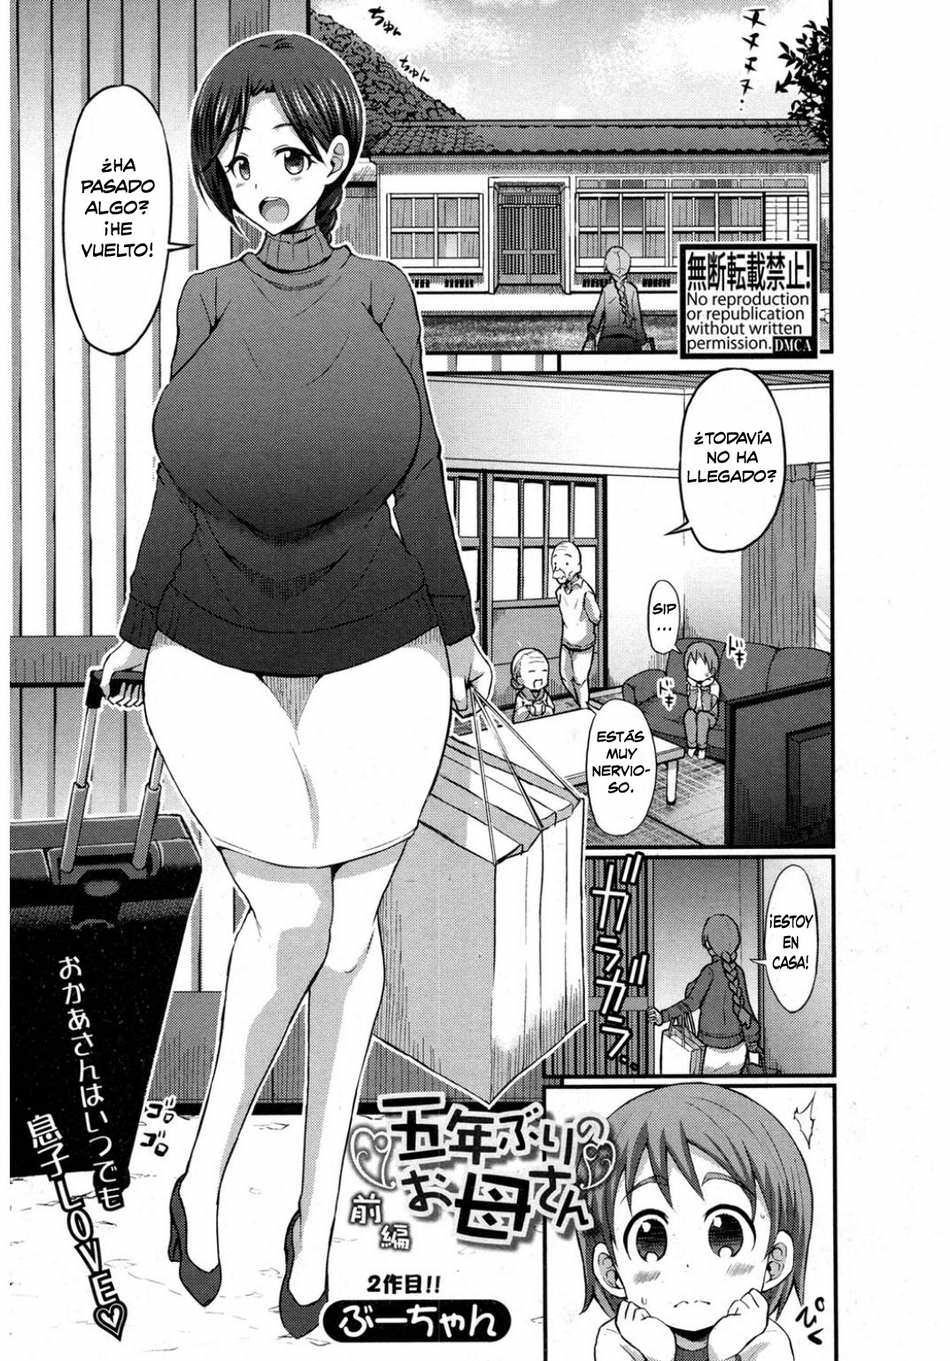 Gonenburi no Okaa-san 1 - Page #1